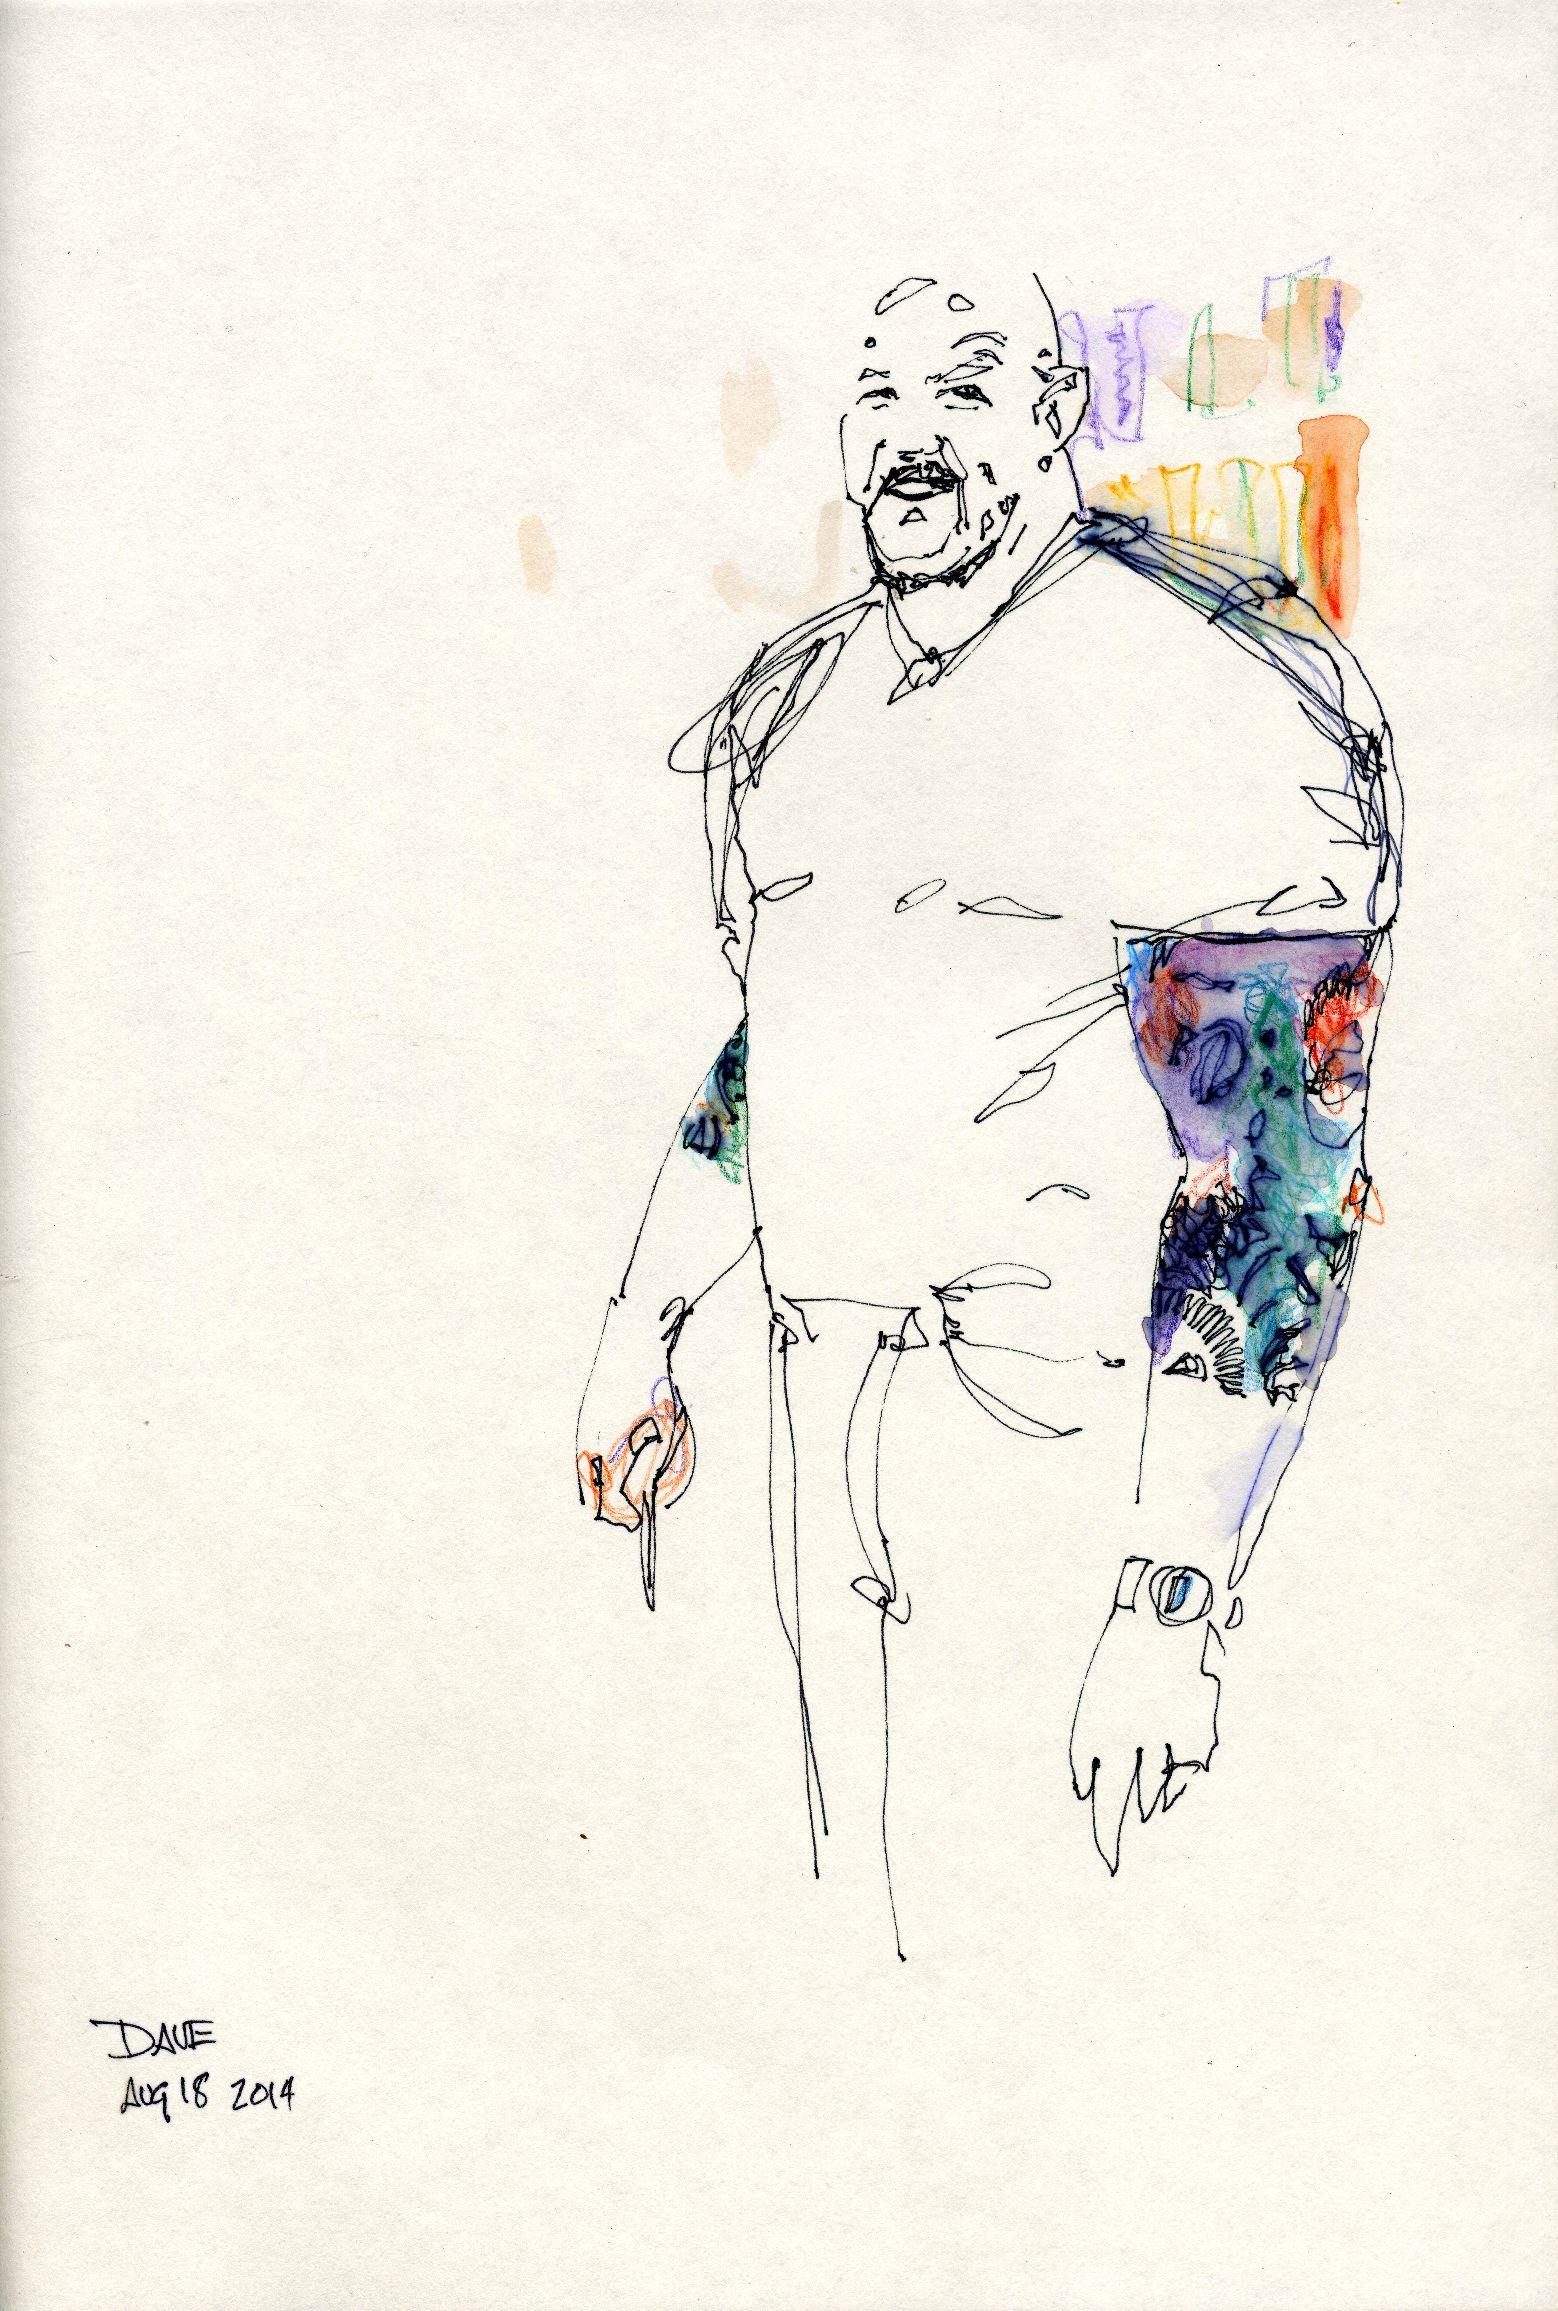 Tom sketch 2.jpg